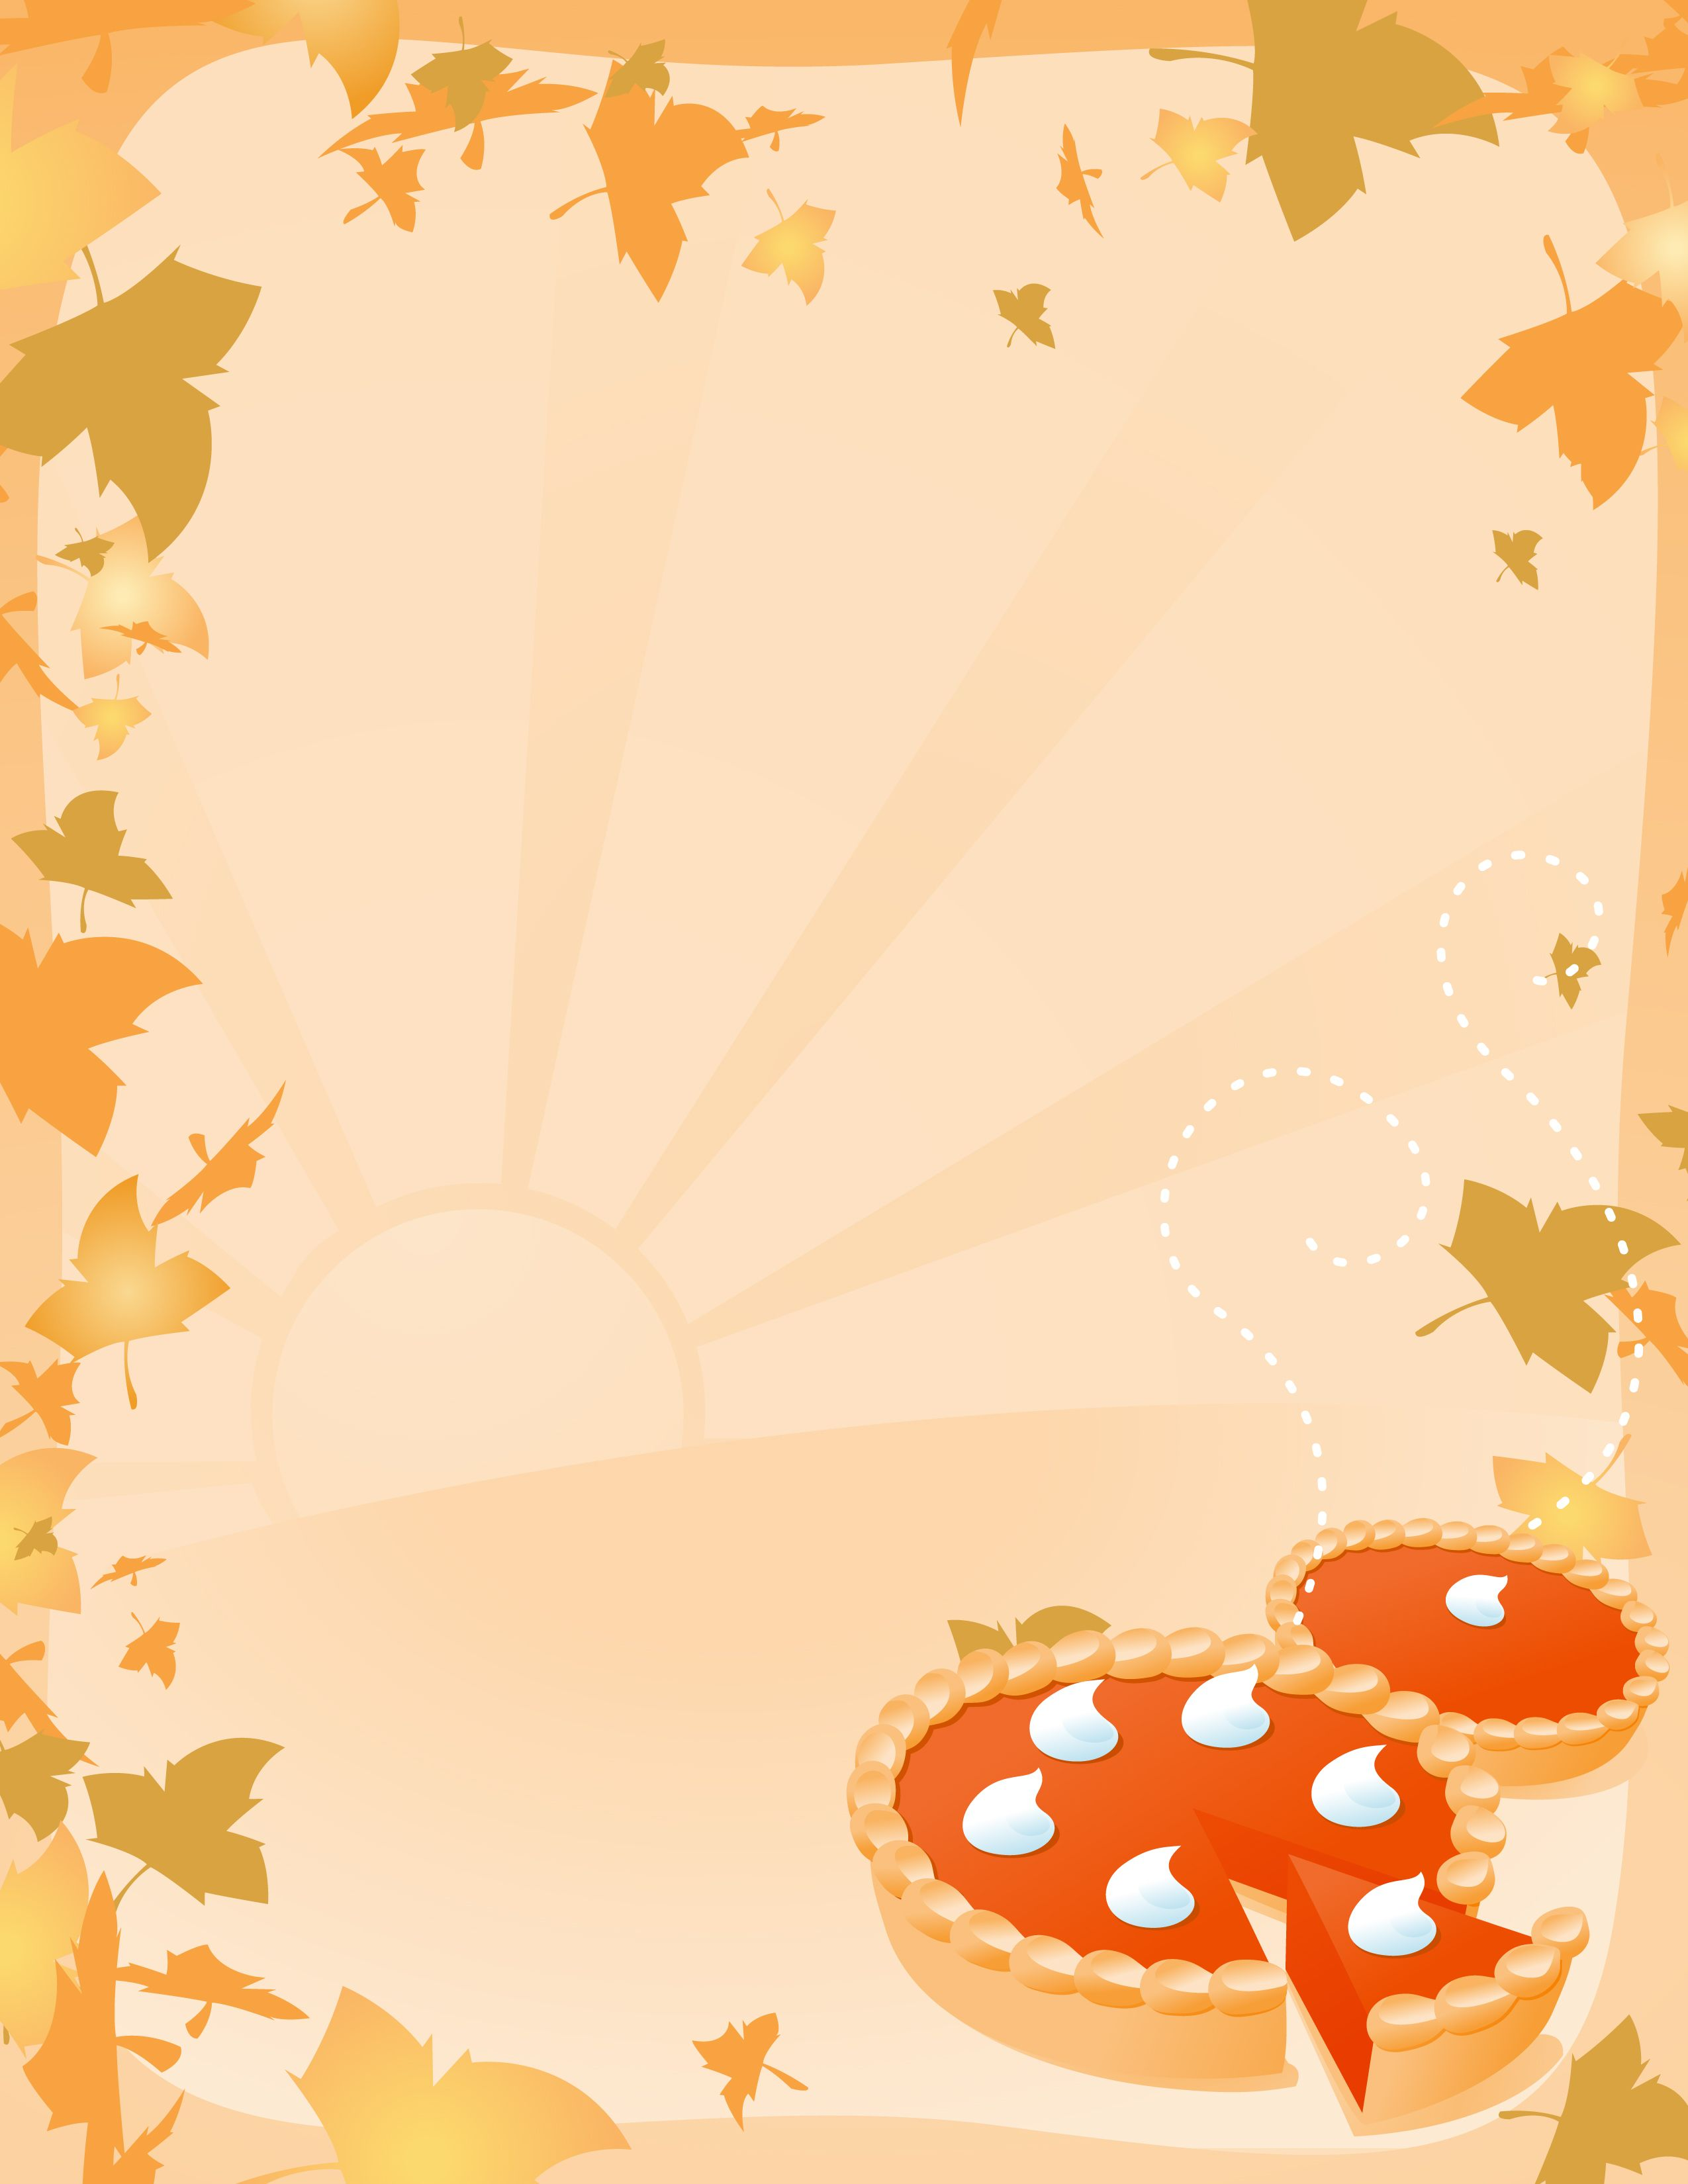 Pumpkin Pie Background Thanksgiving Clip Art Clip Art Borders Scrapbook Creations